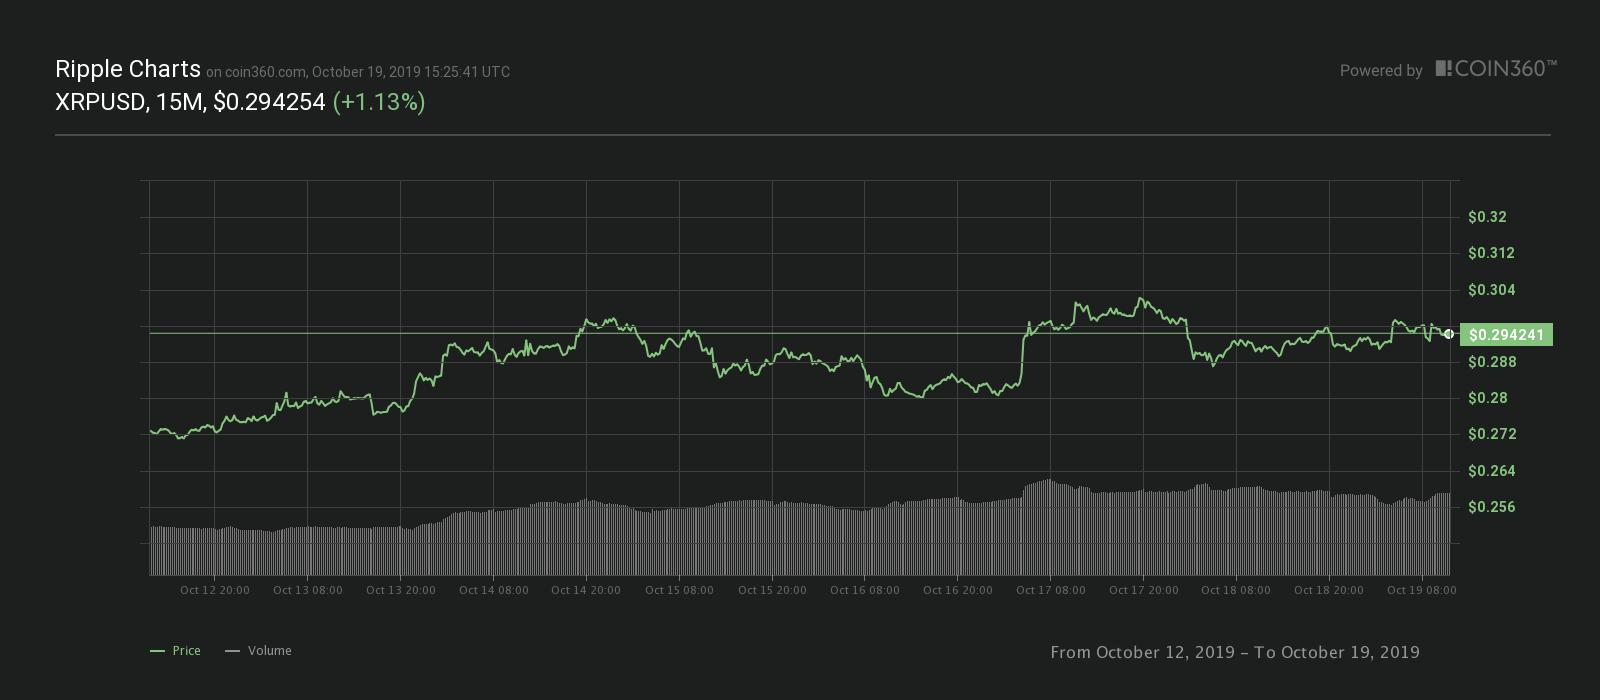 Gráfico de precios de XRP de 7 días. Fuente: Coin360